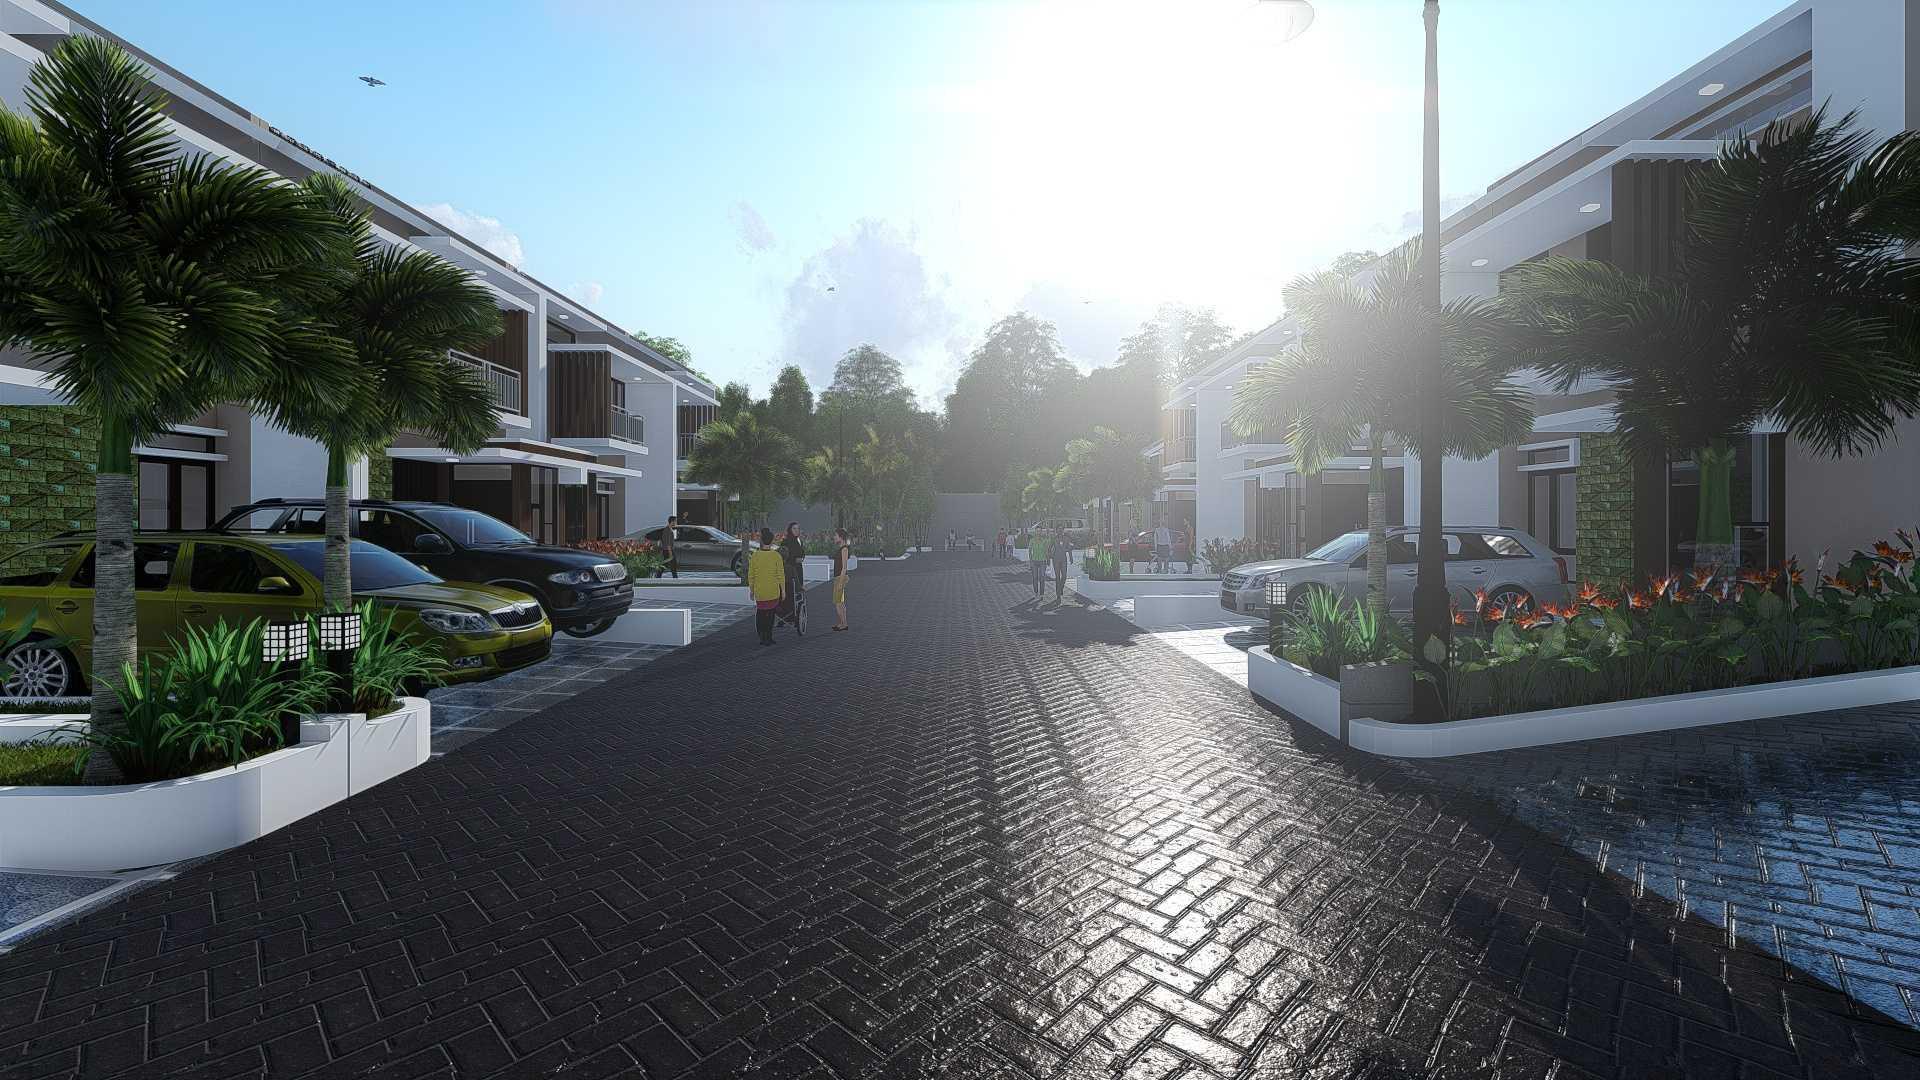 Roema Architect & Developer Cassia Wood Tambun Sel., Bekasi, Jawa Barat, Indonesia Tambun Sel., Bekasi, Jawa Barat, Indonesia Street View   46568